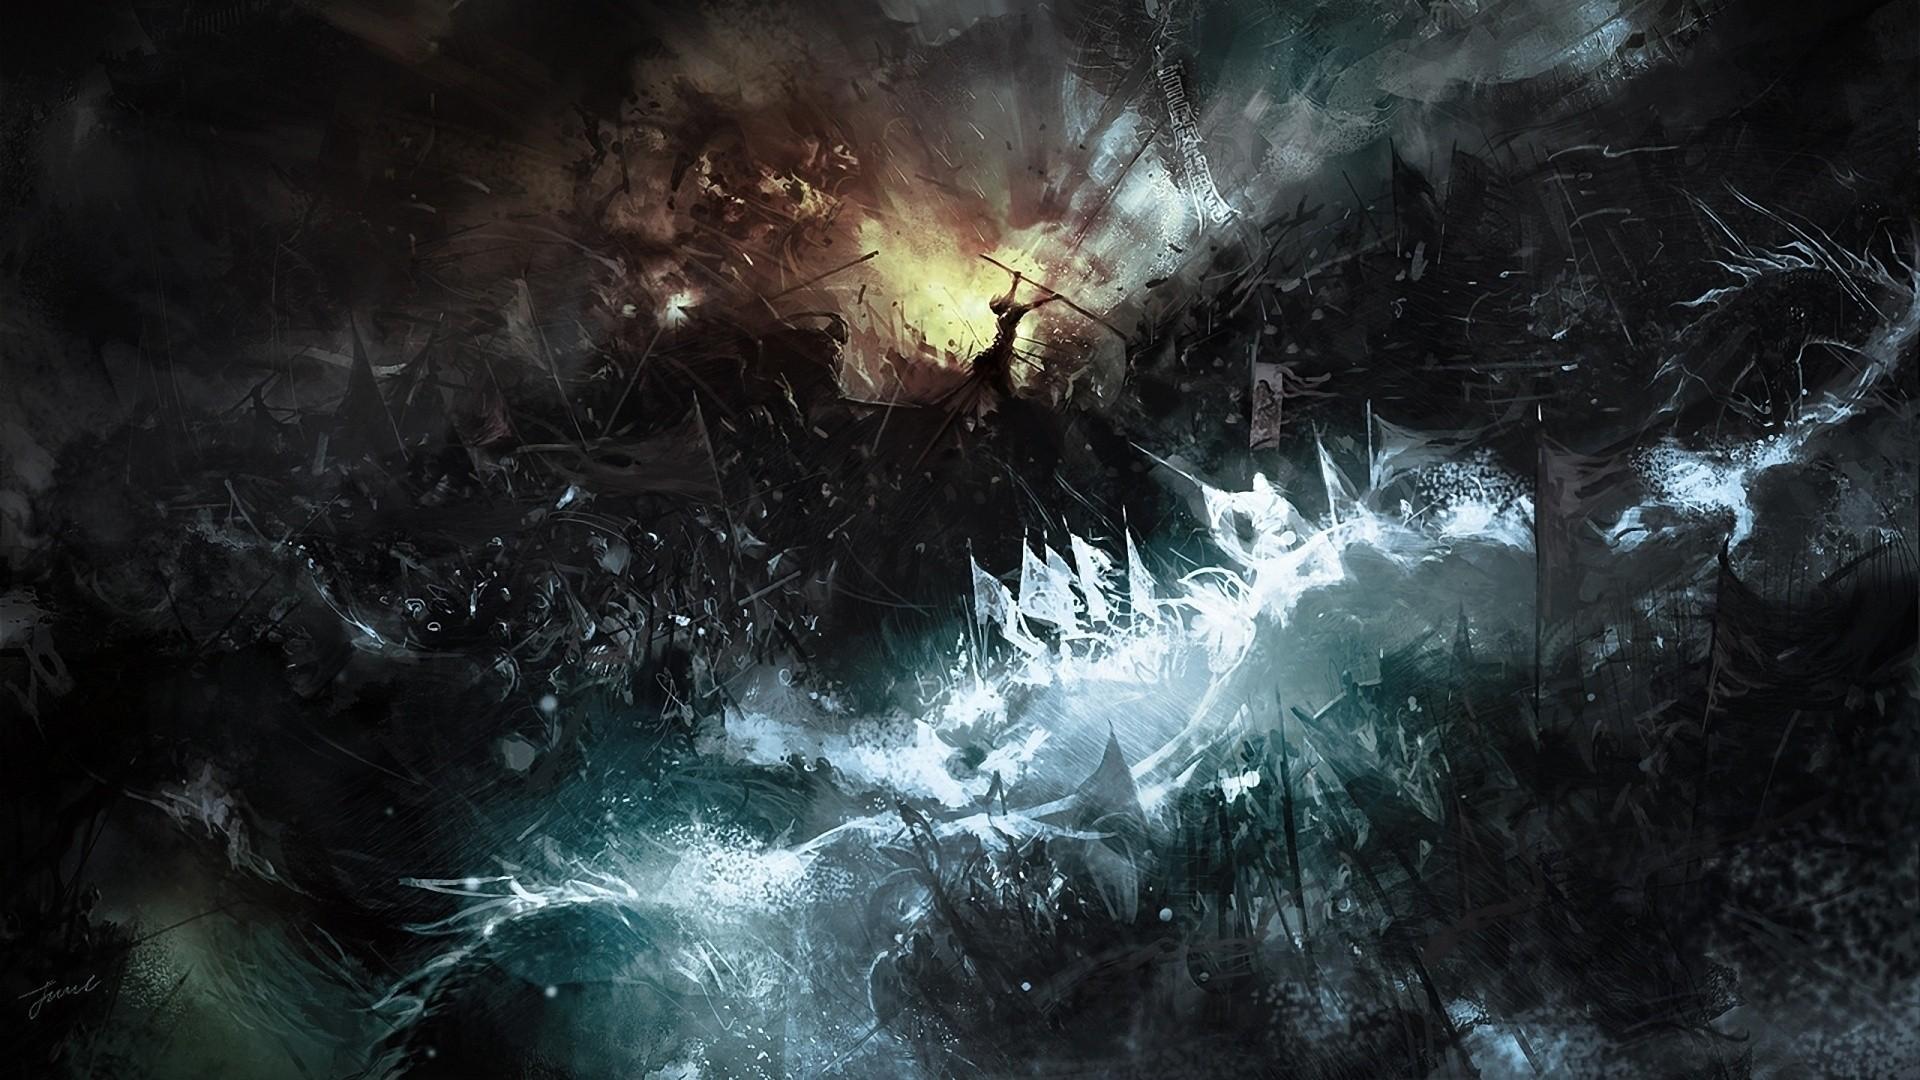 General 1920x1080 digital art war fantasy art battle